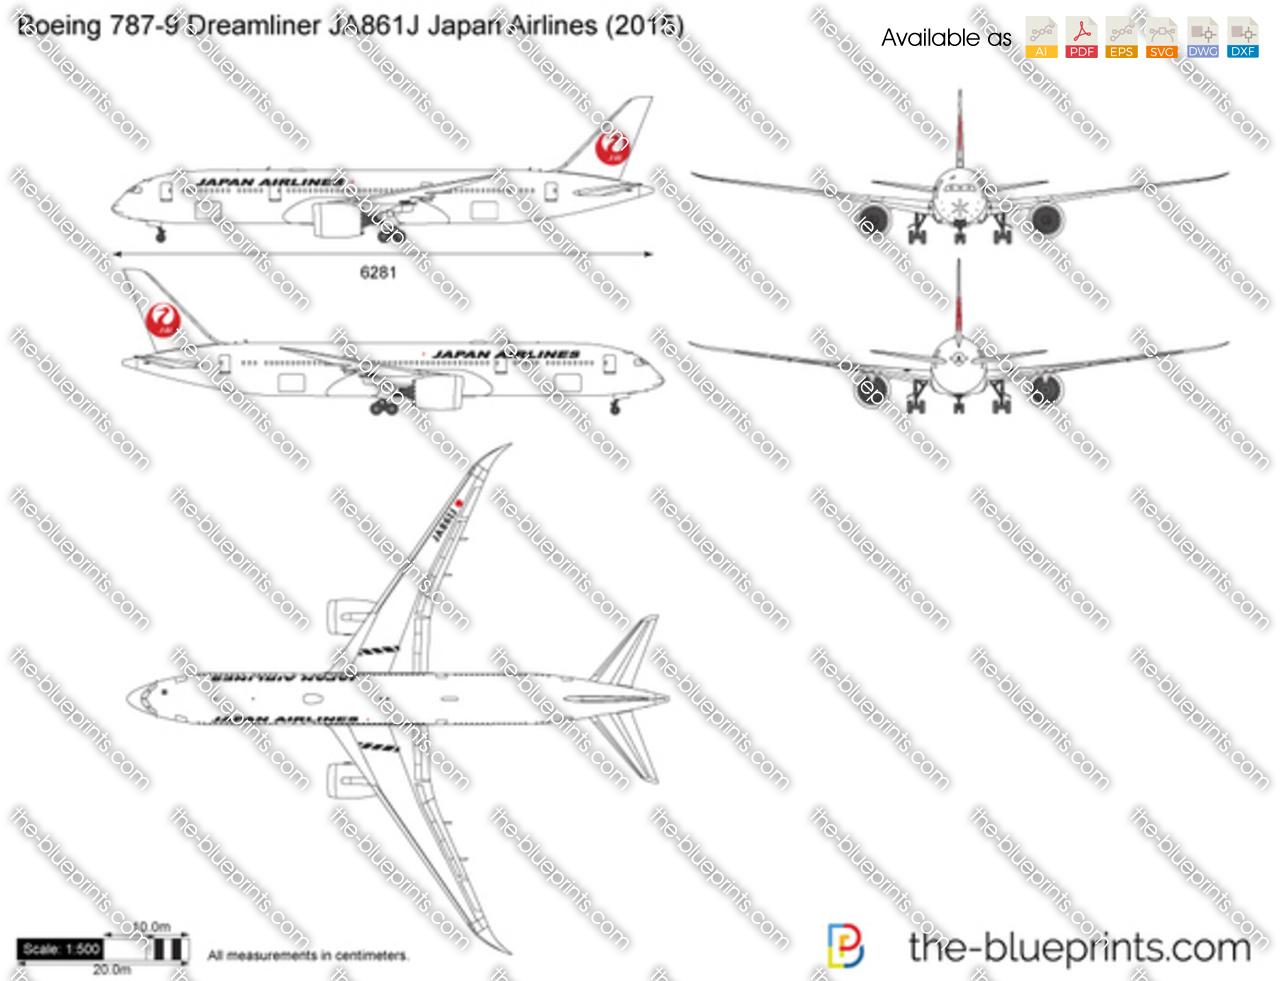 Boeing 787-9 Dreamliner JA861J Japan Airlines 2016